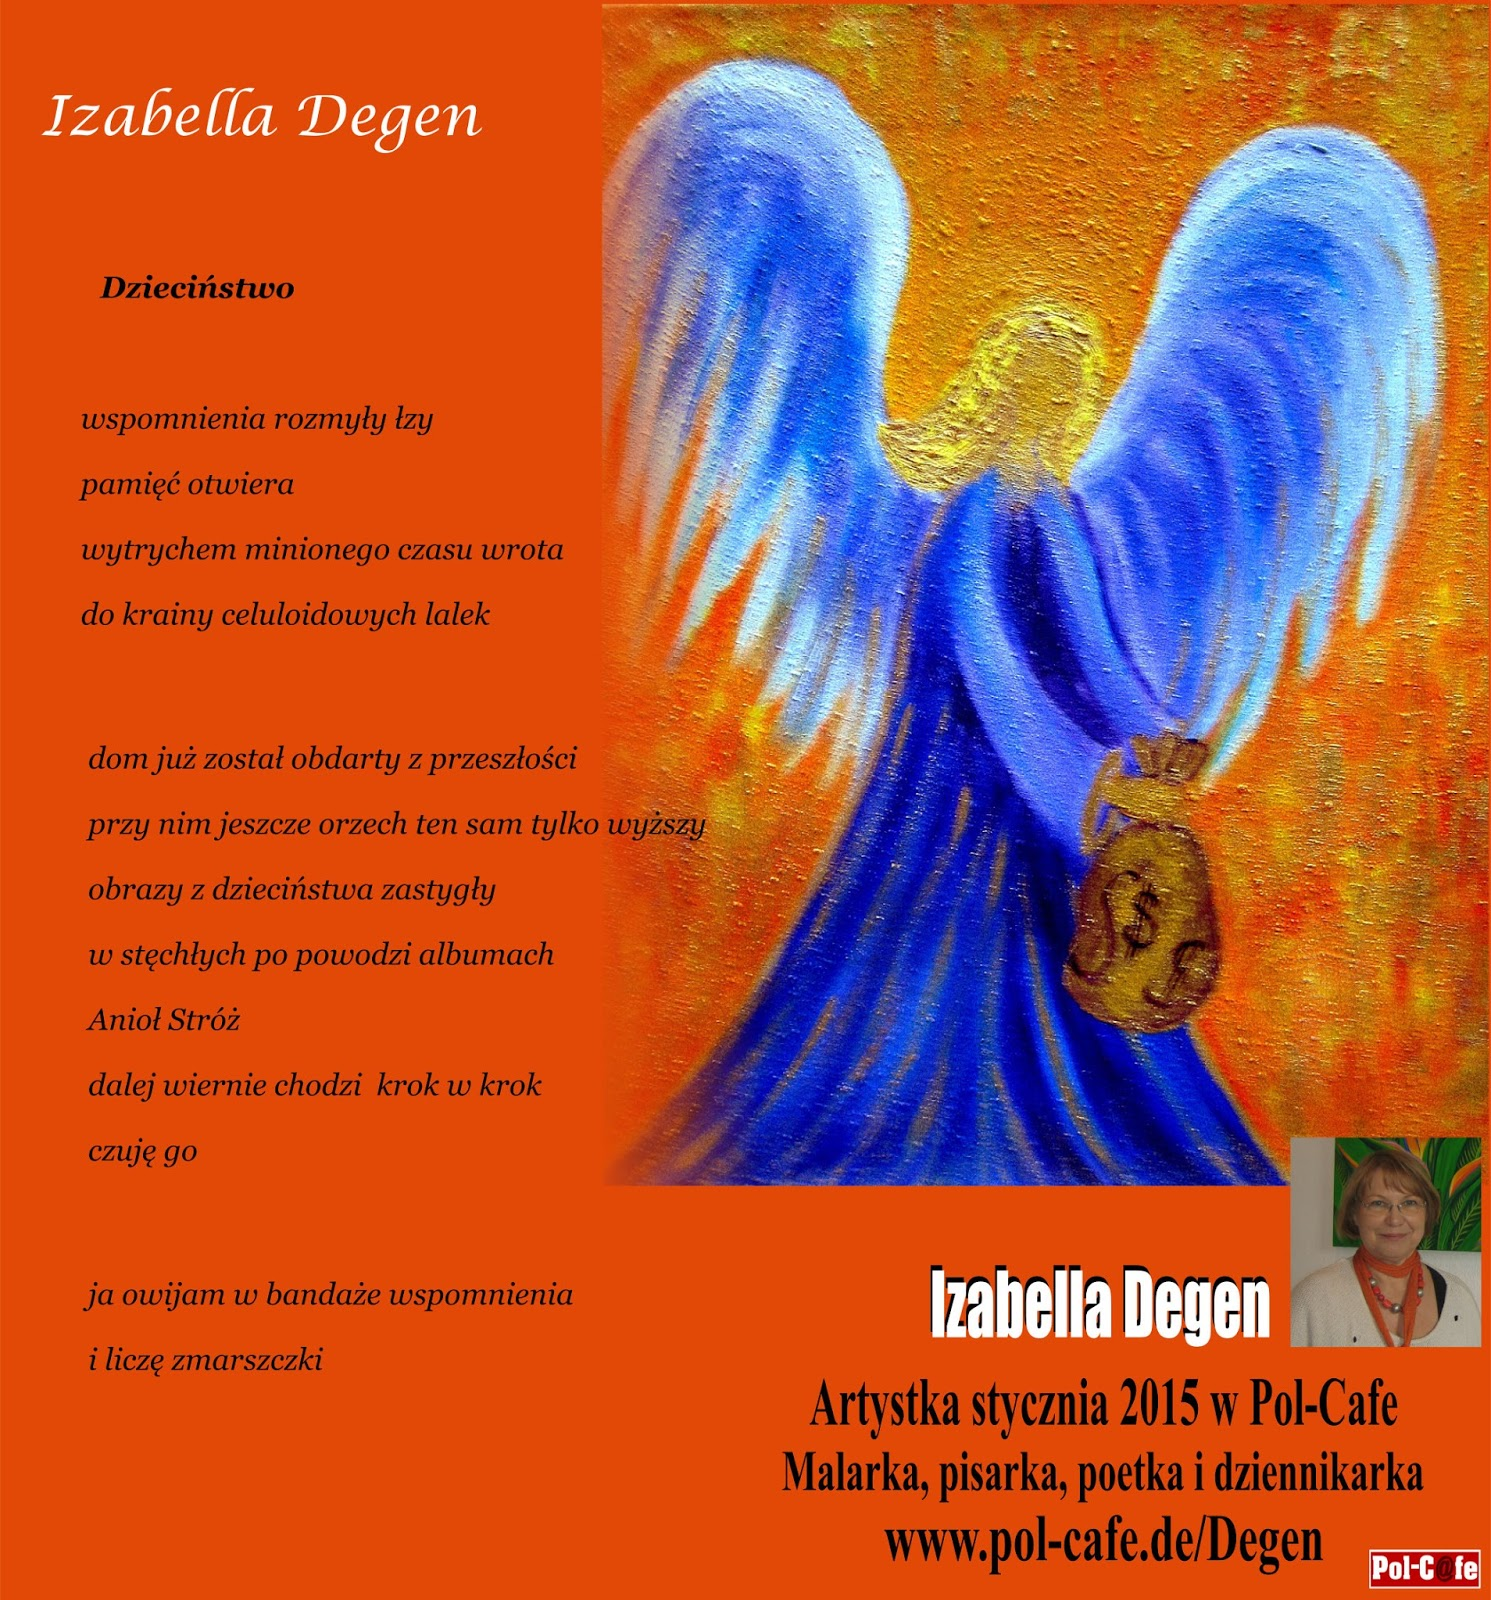 Proza I Poezja Izabelli Vel Isabel Degen Wiersze I Obrazy